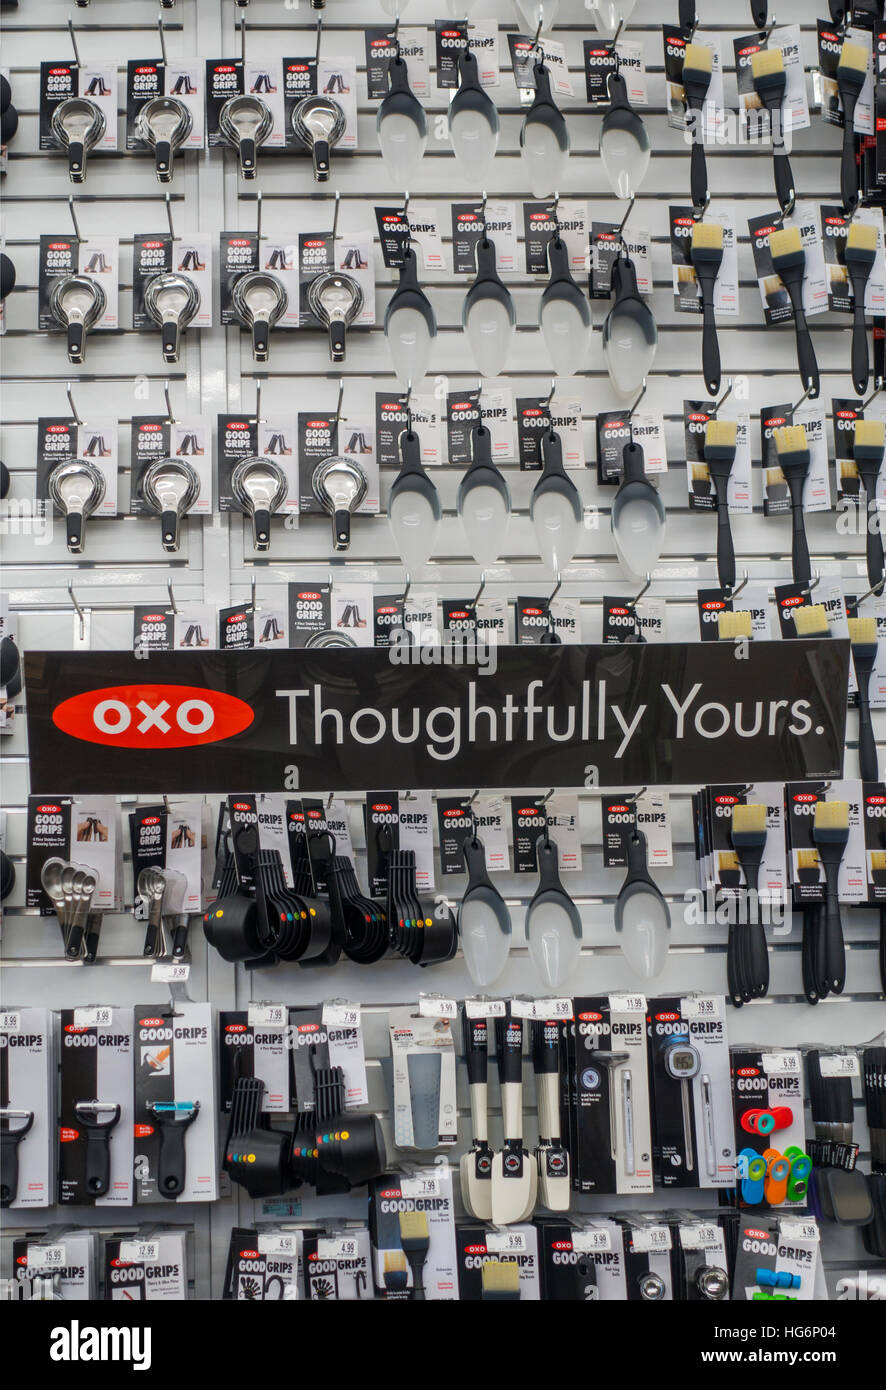 oxo kitchen supplies bay window seat table target store stock photo 130456036 alamy